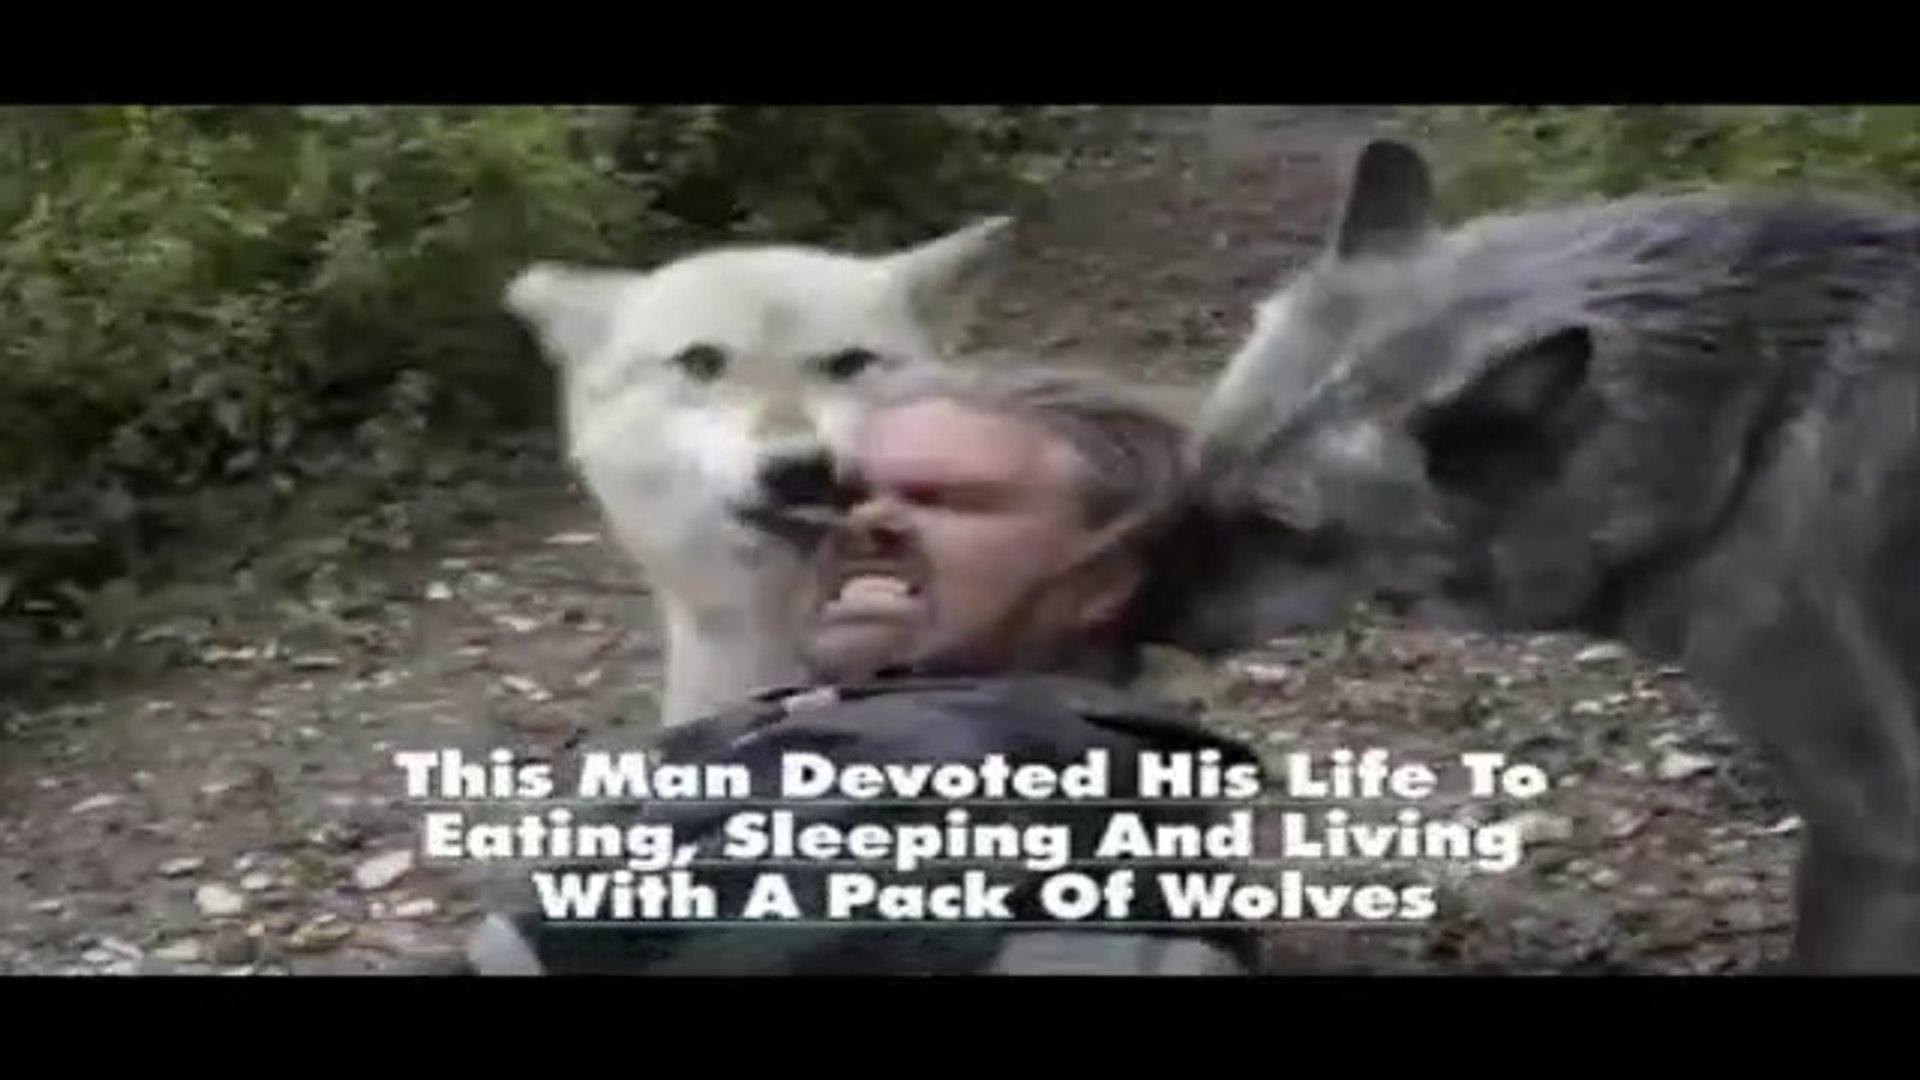 KURT ADAMIN KURTLAR ile YASAMI - WOLF MAN and WOLVES LiFE